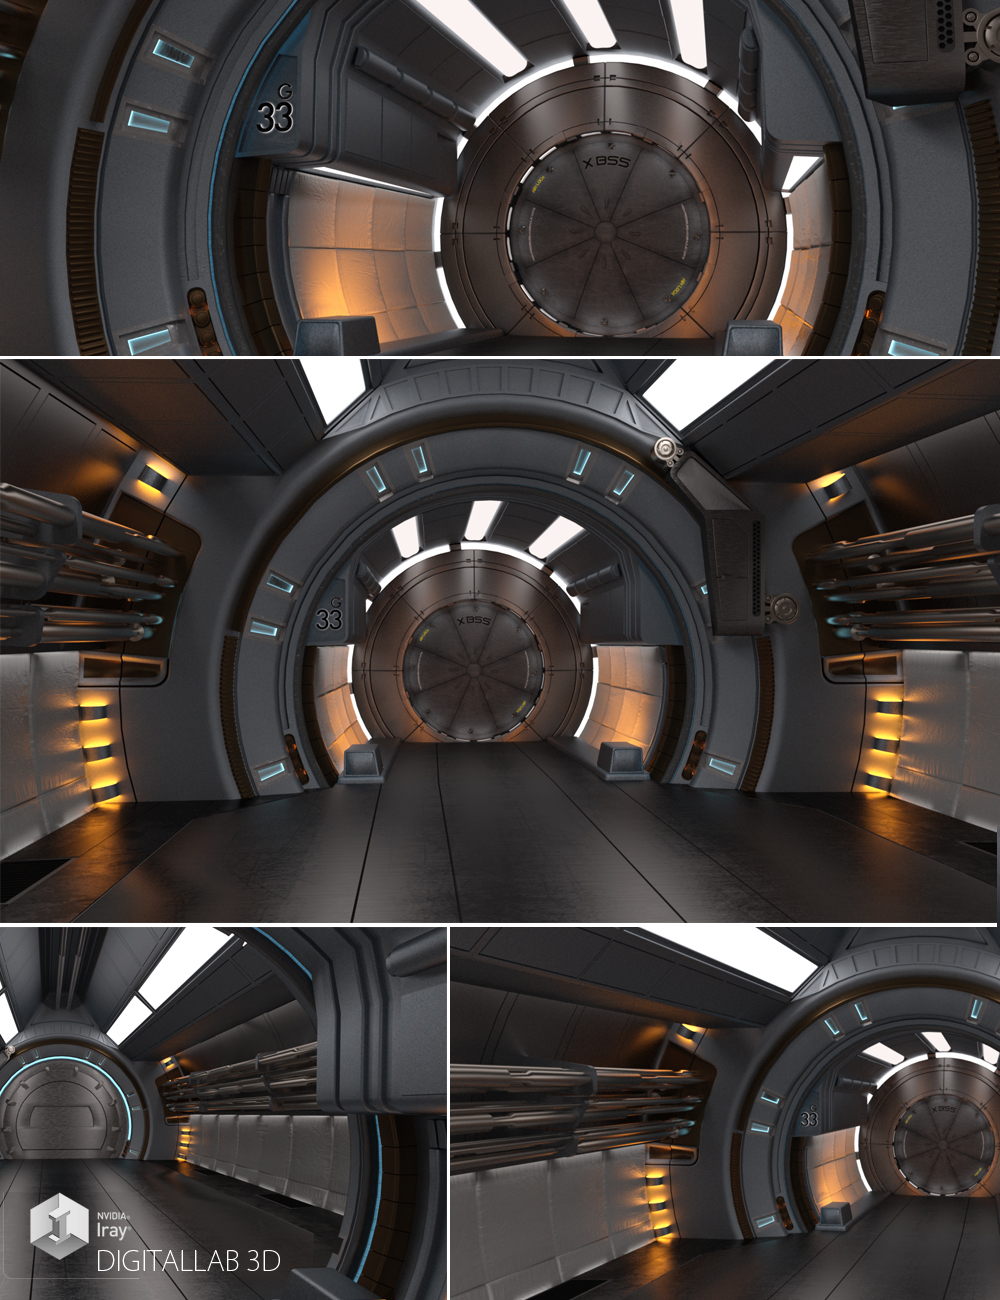 ESA Europa Corridor by: Digitallab3D, 3D Models by Daz 3D